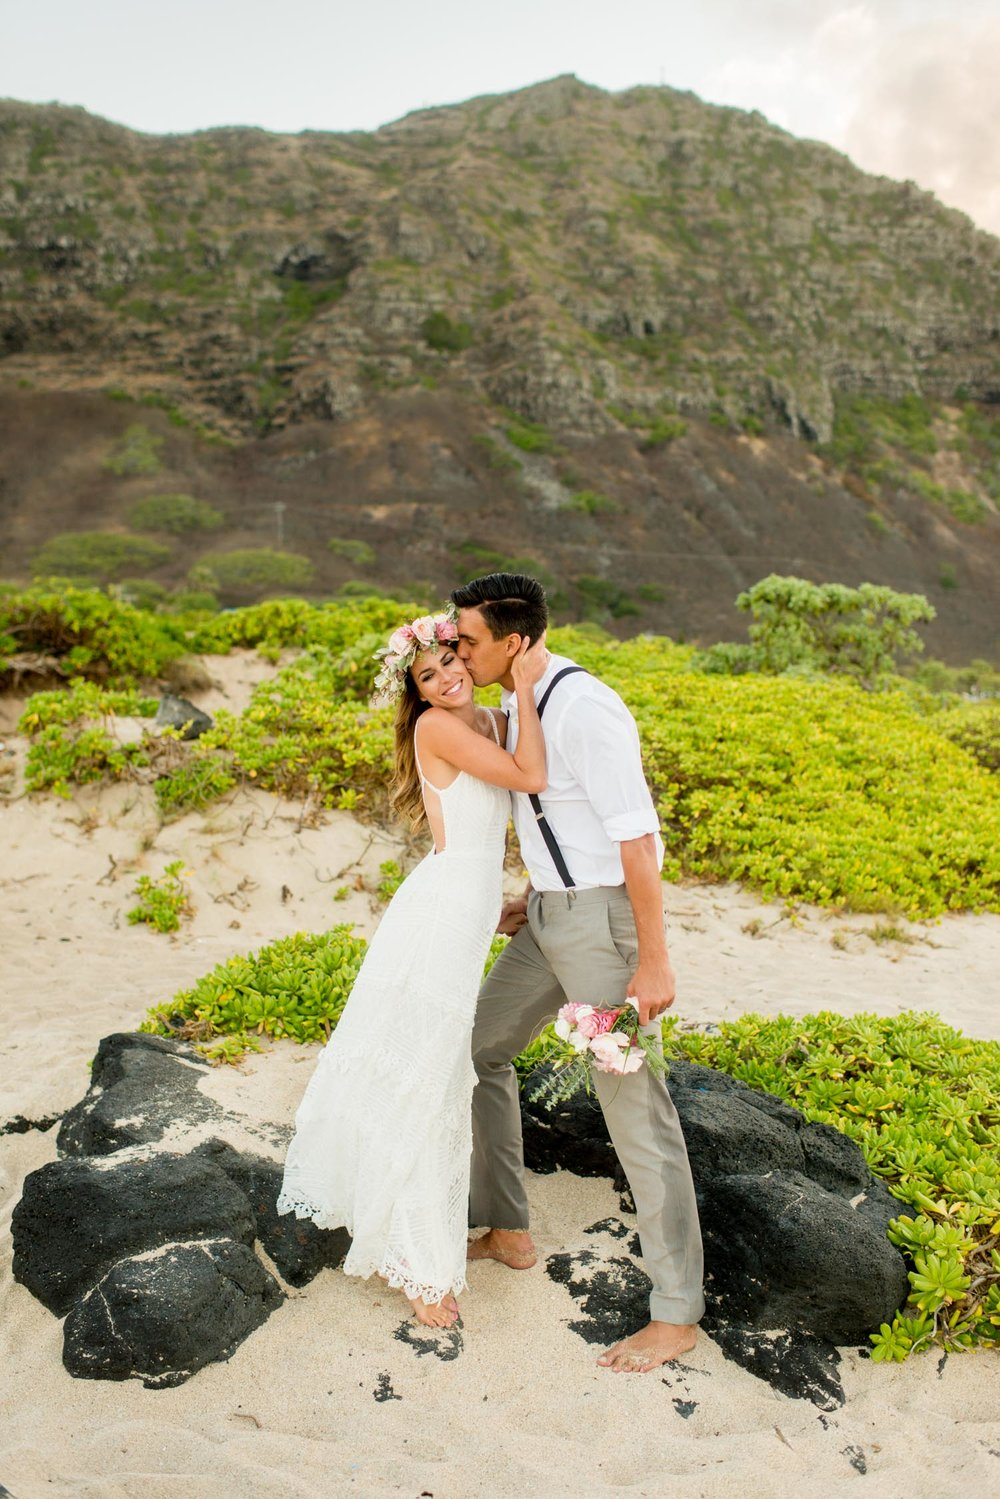 OAHU WEDDING PHOTOGRAPHER. BRIDAL PORTRAIT WITH PINK AND BLUSH HAKU LEI.